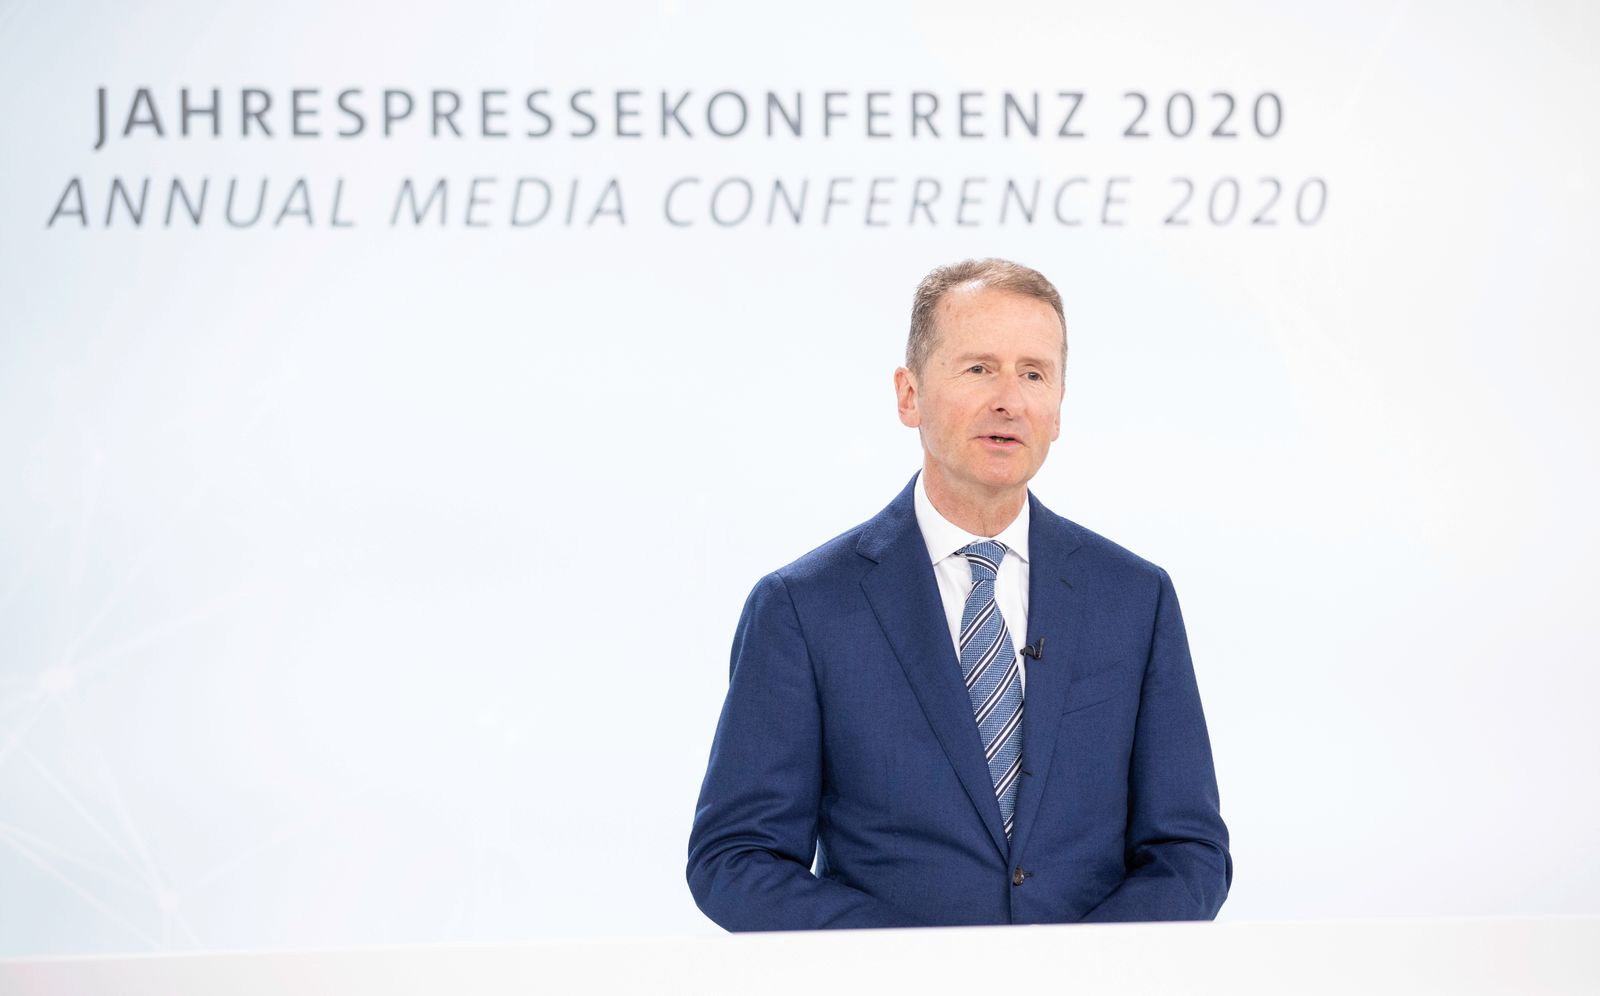 Herbert Diess / Volkswagen AG Annual Media Conference 2020